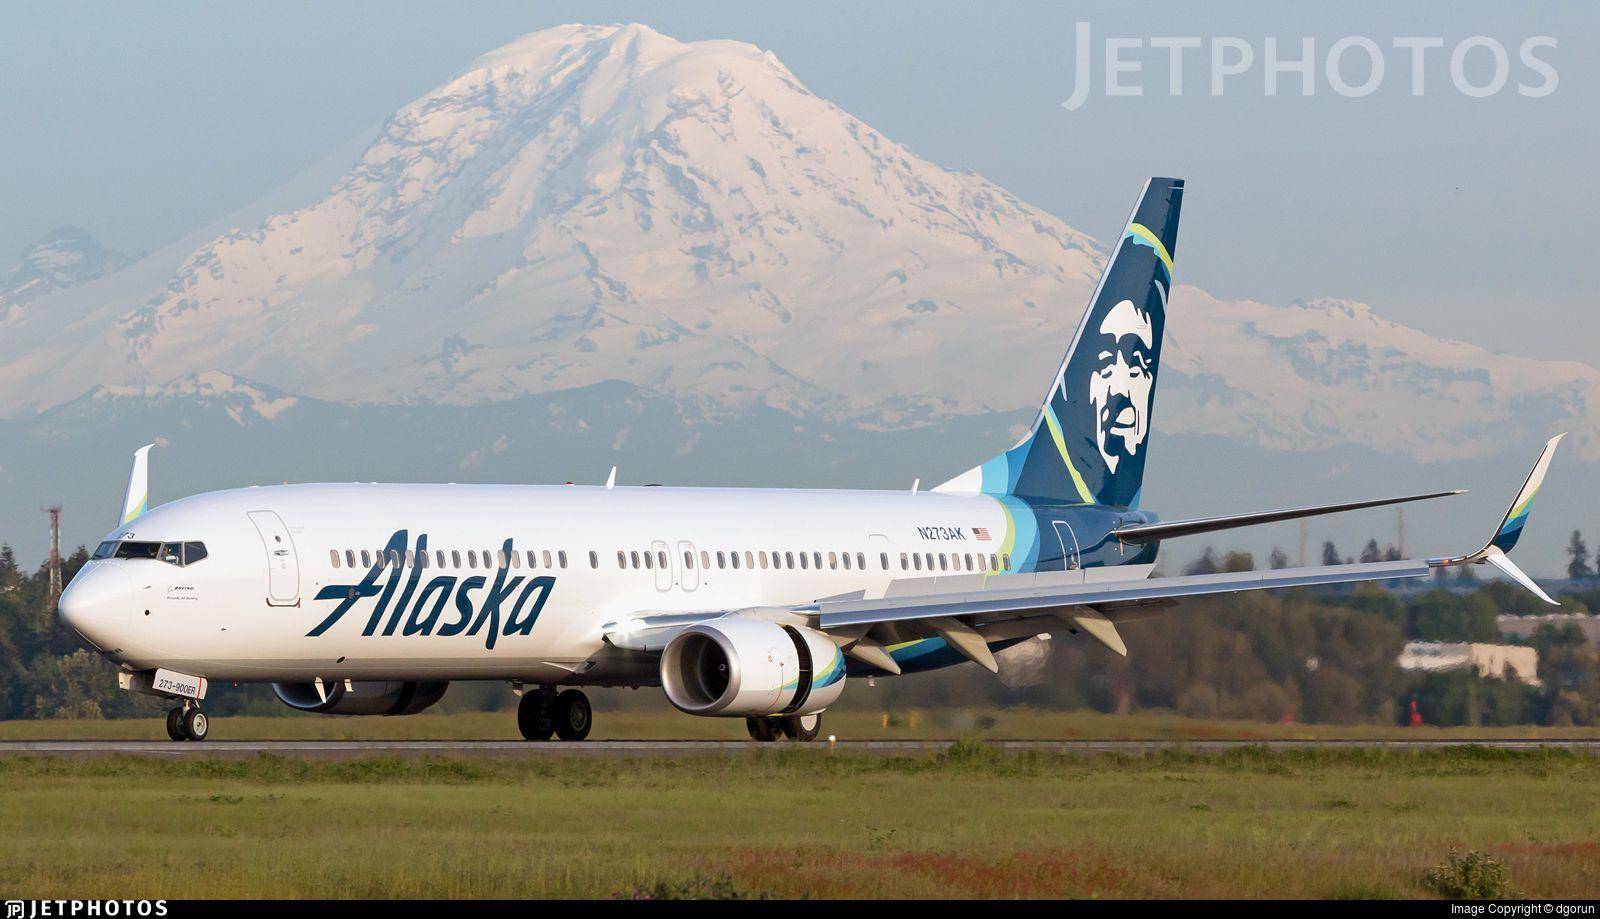 Pin on Alaska airlines